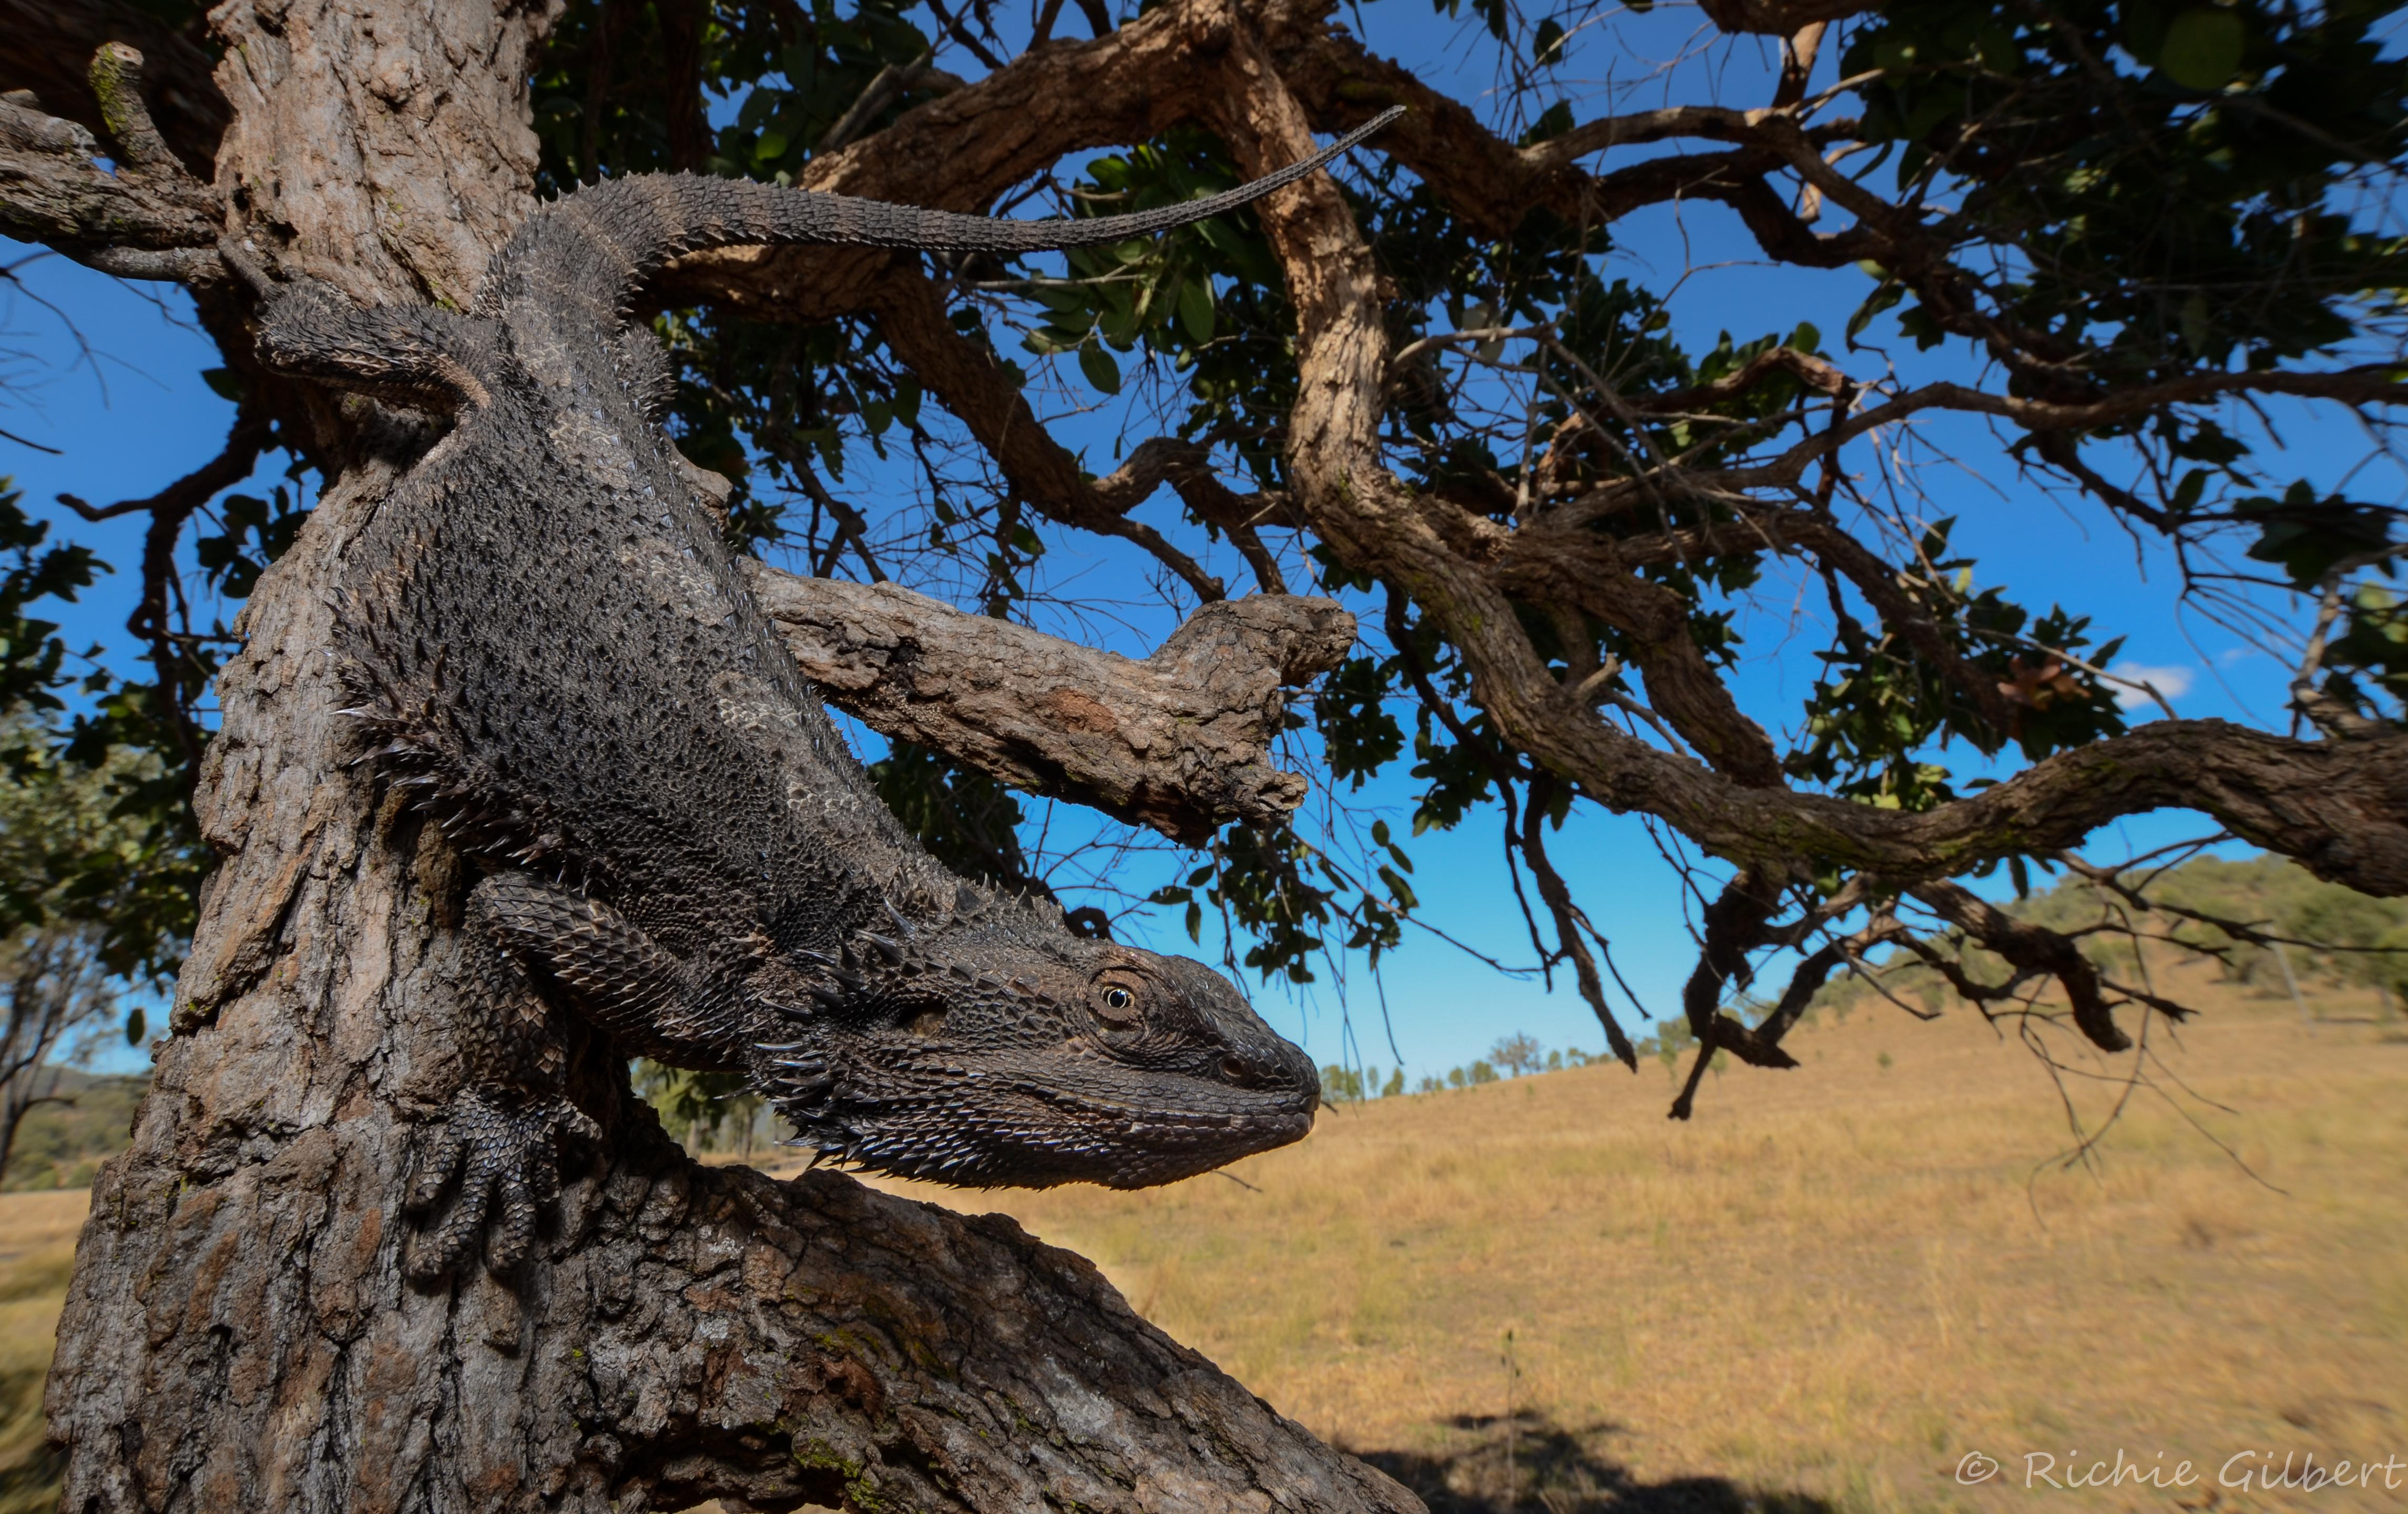 lizard climbing down tree